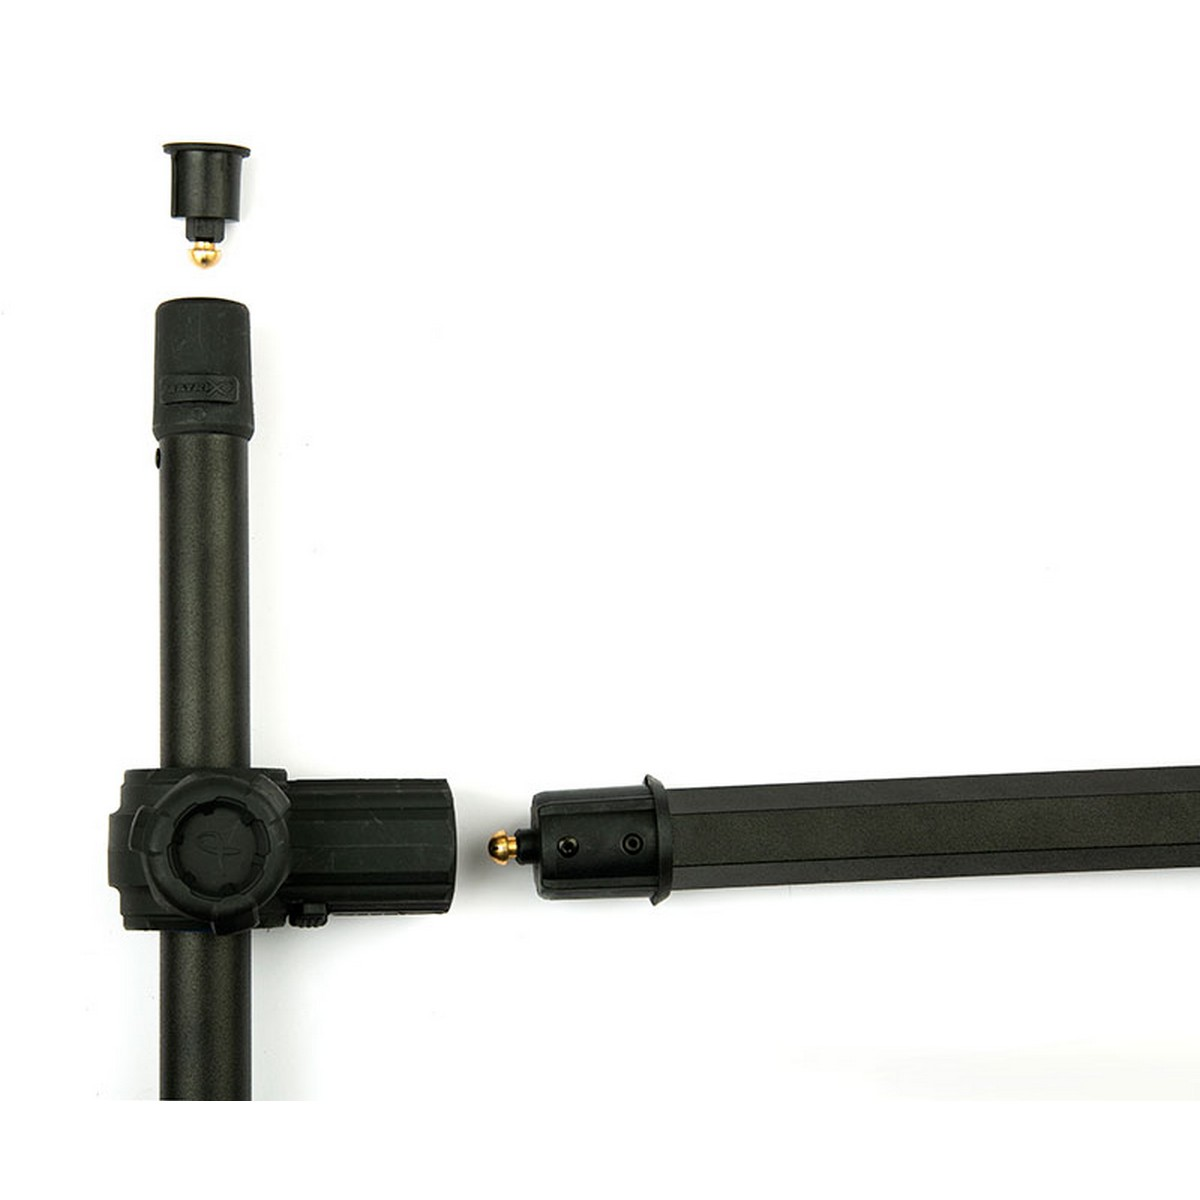 Прикачна за платформа Matrix 3D-R Feeder Arm Rigid - Универсално рамо